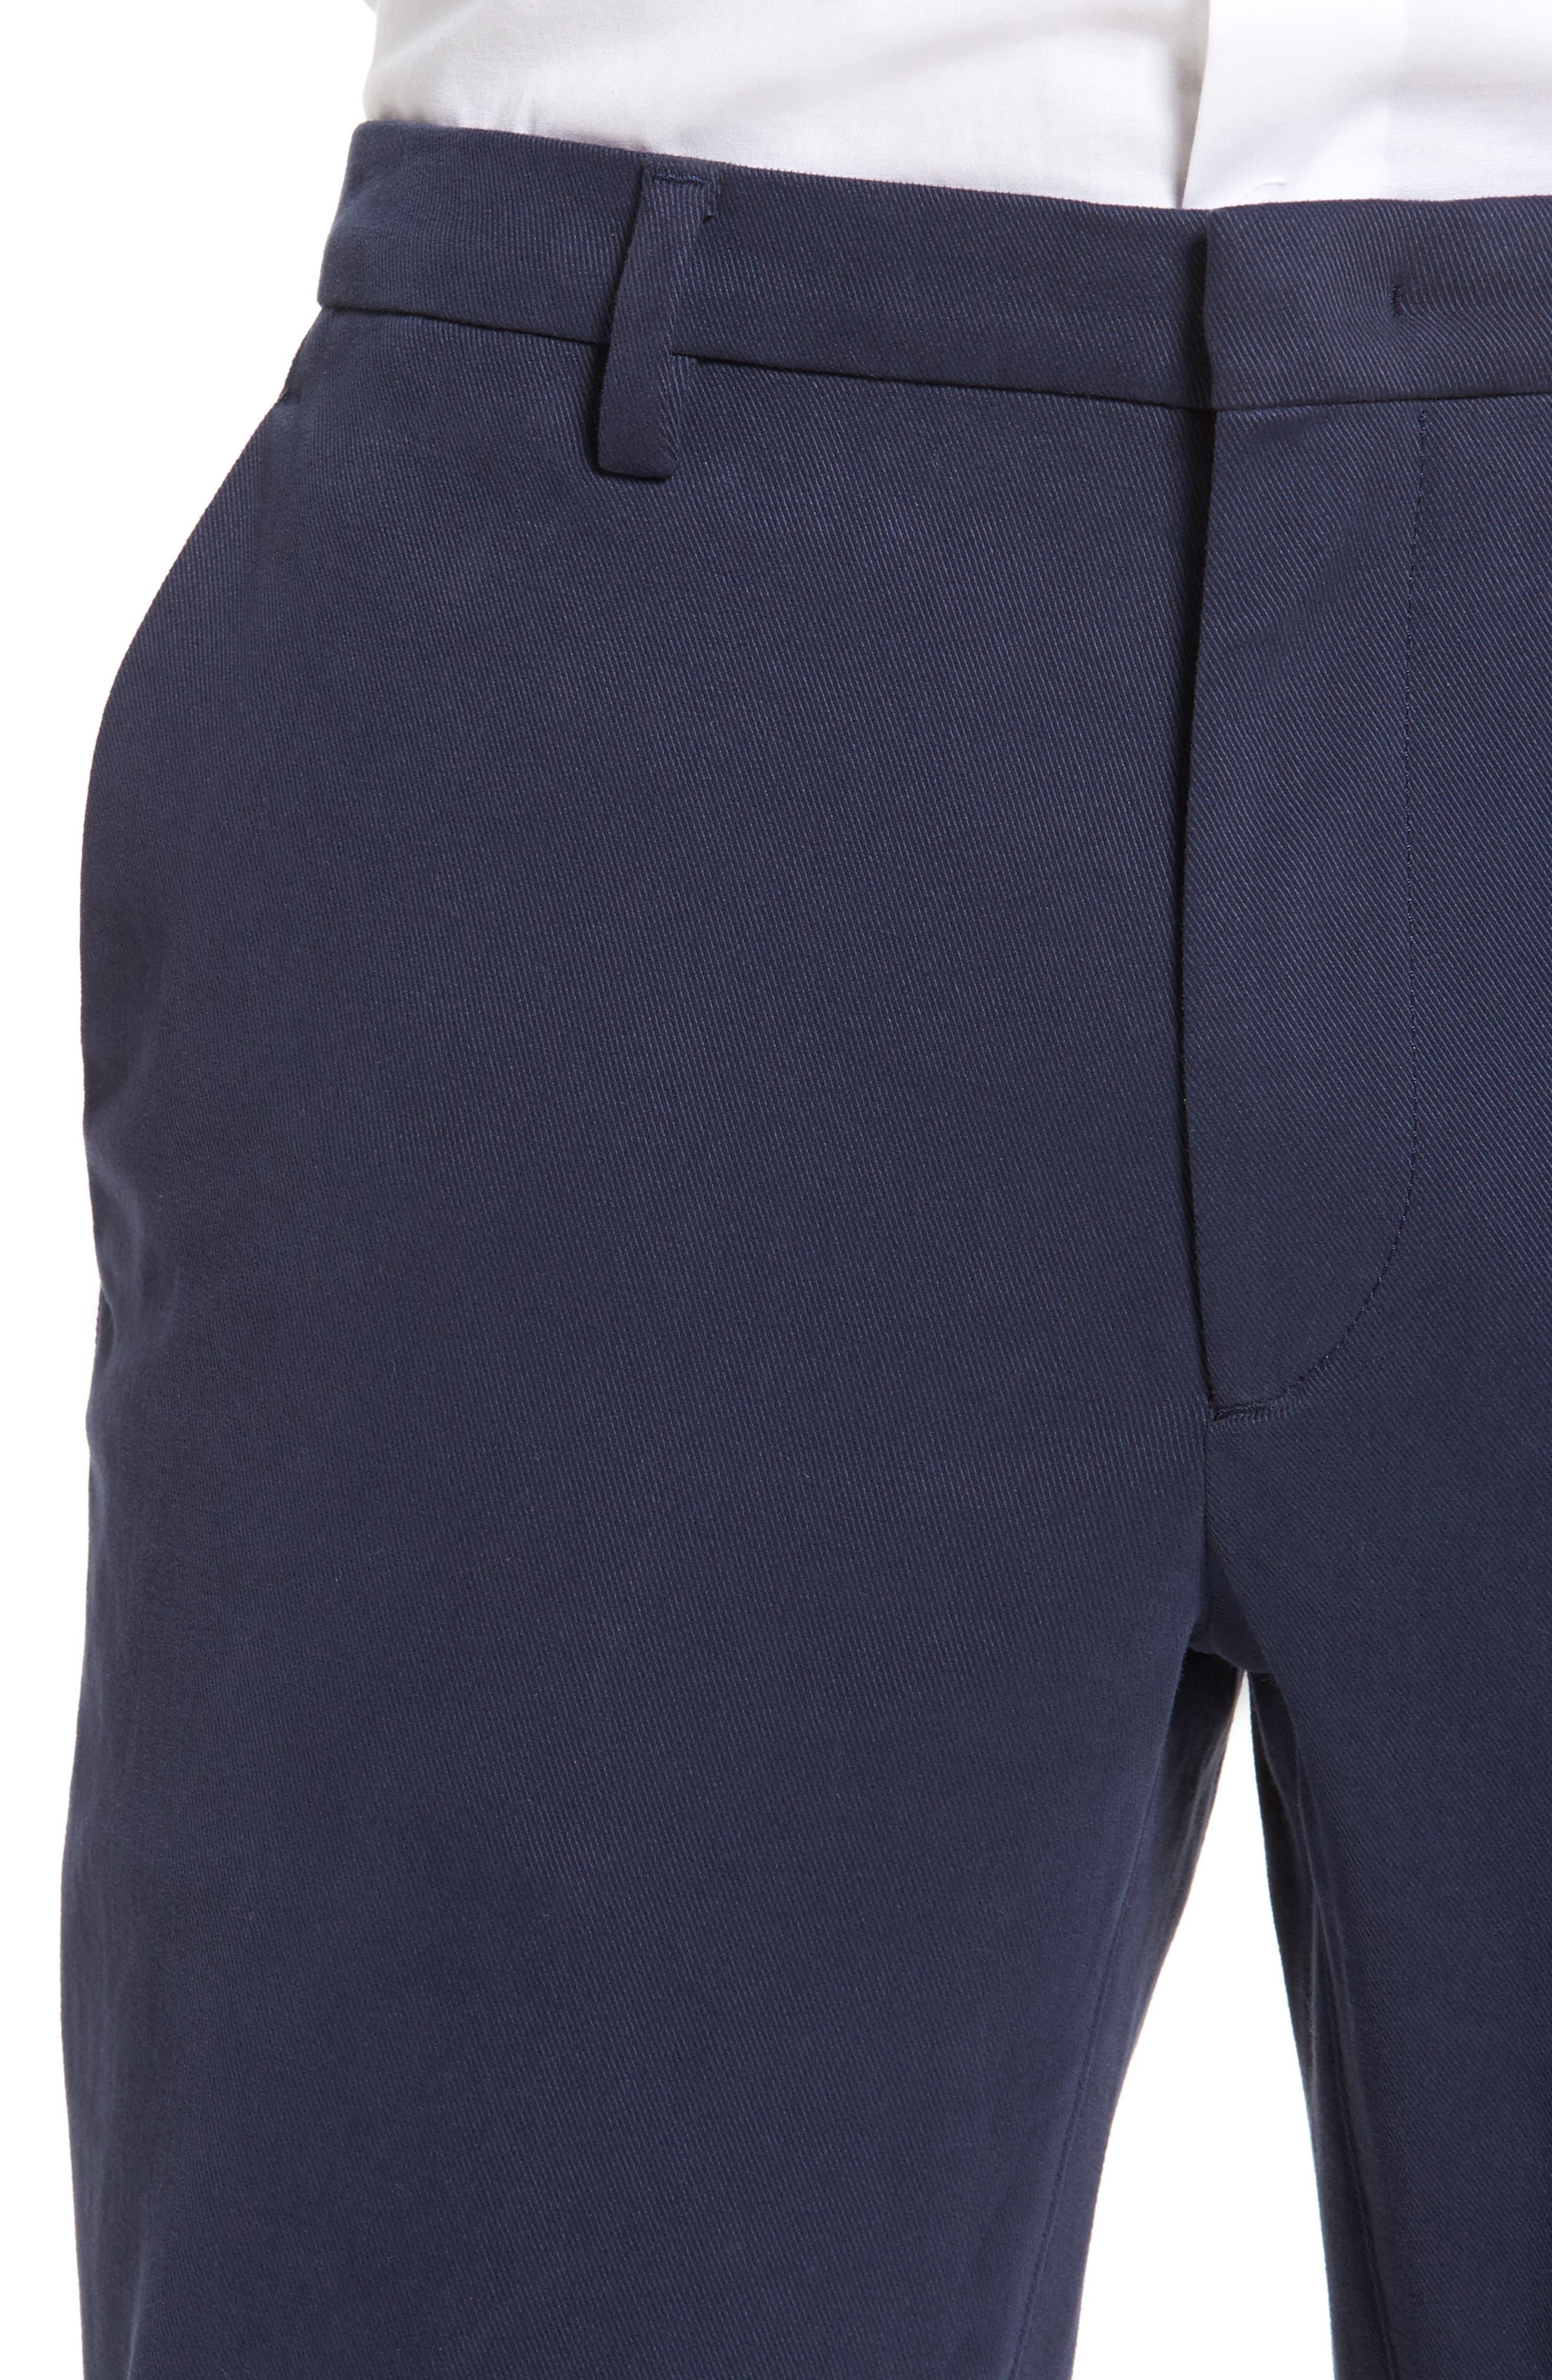 Kaito Stretch Chino Pants,                             Alternate thumbnail 3, color,                             Blue